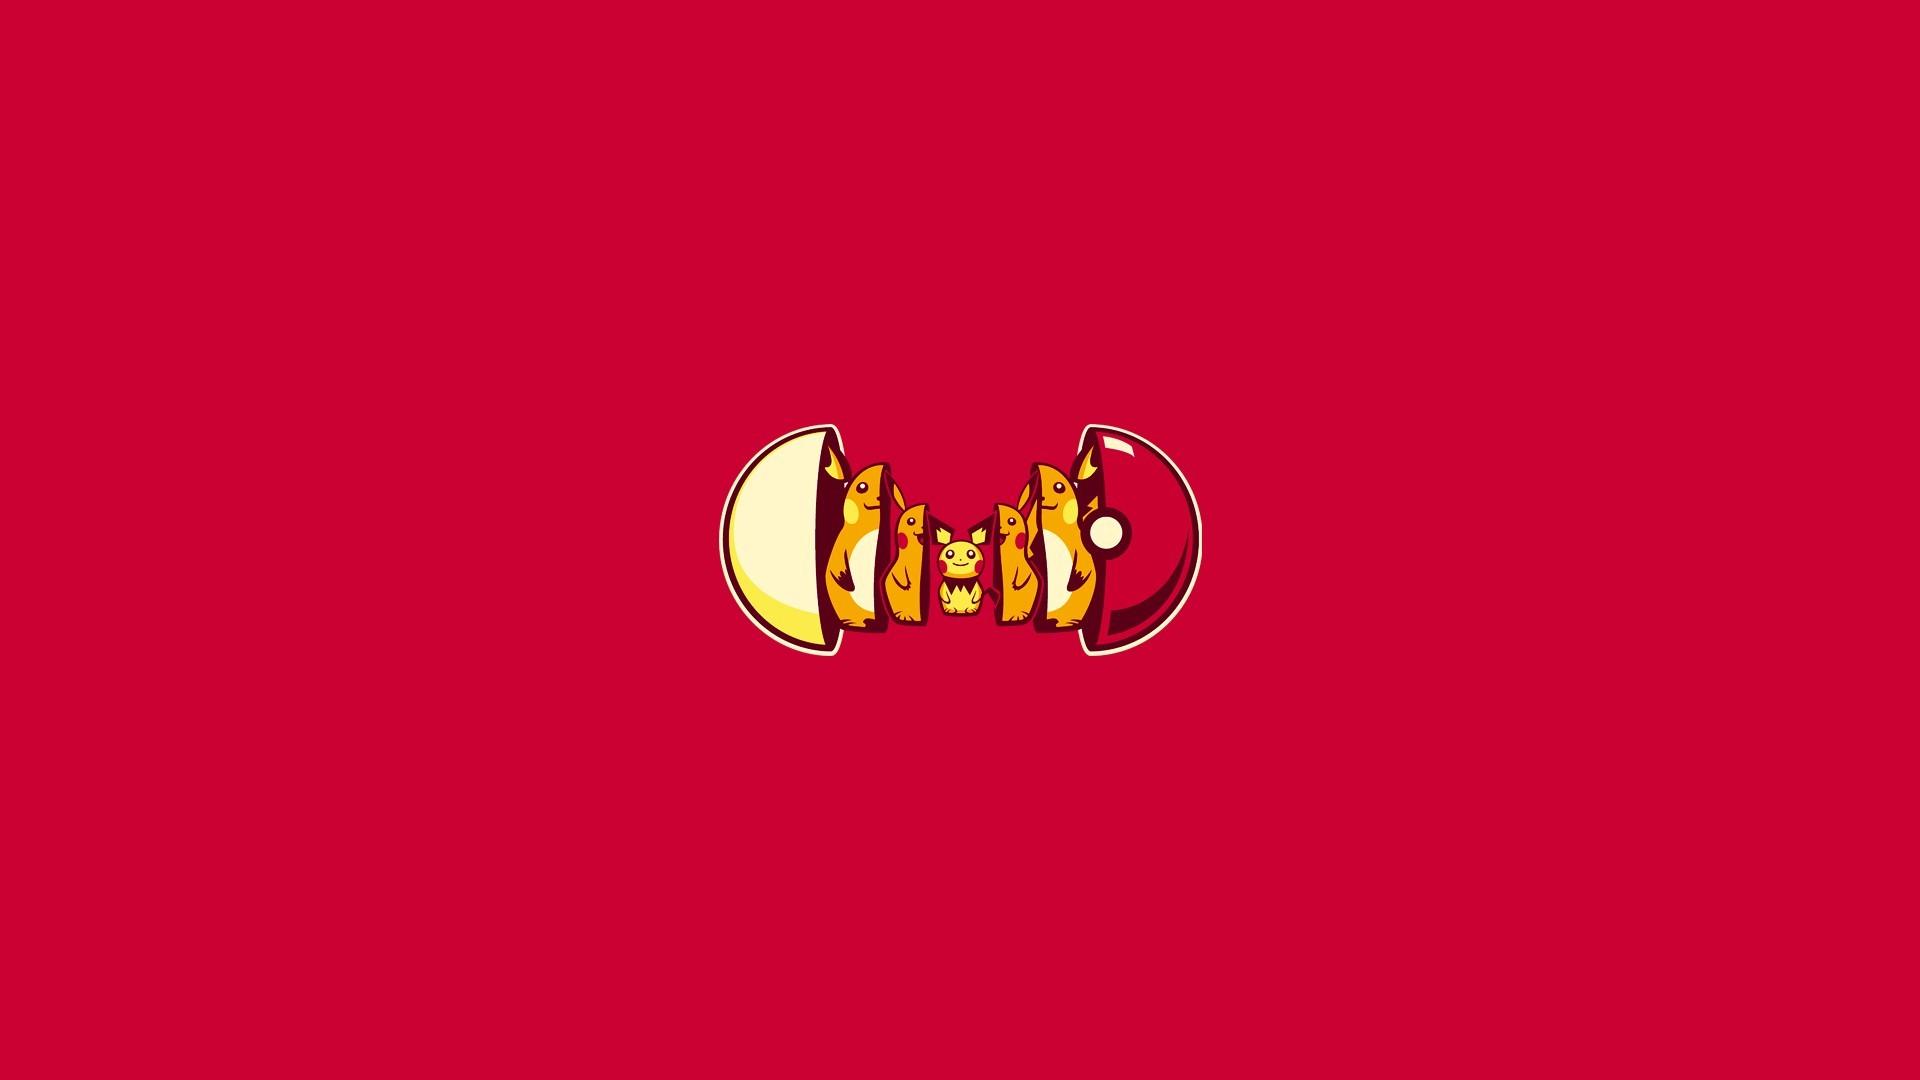 Pokemon Pokeball Pokeball Wallpaper 1920×1080